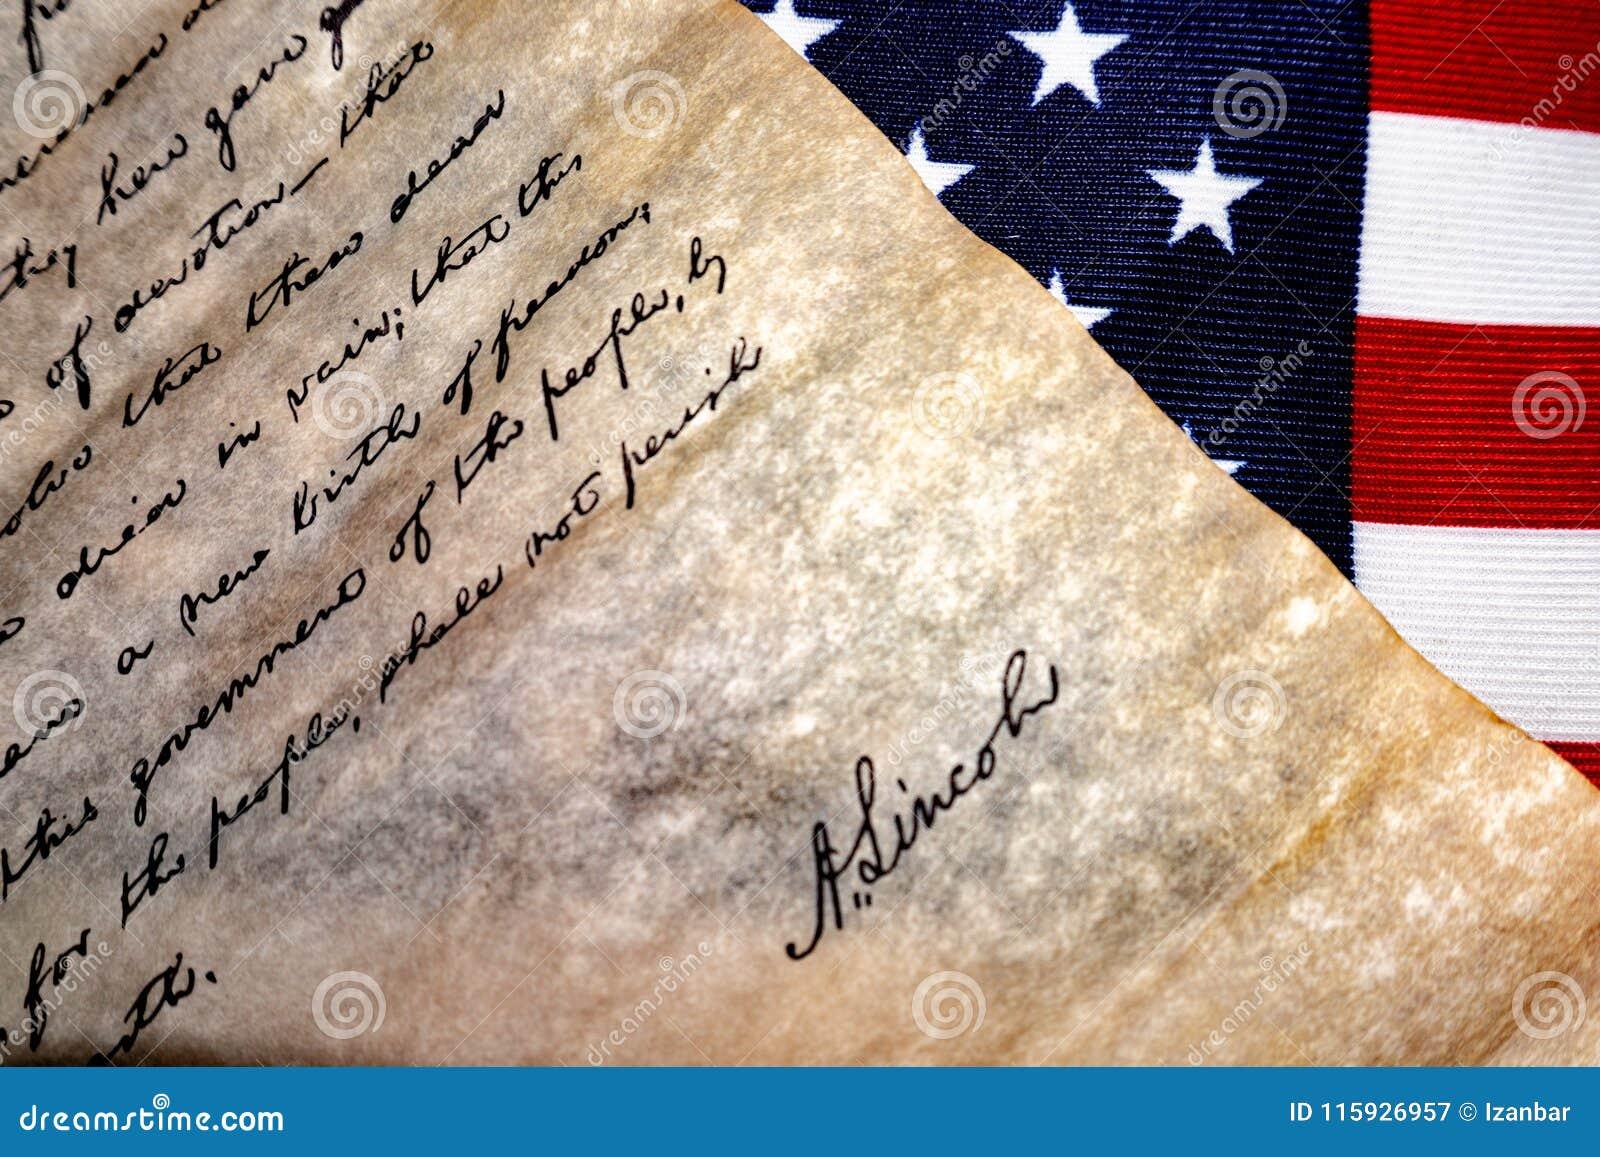 Gettysburg adresu mowa U S abraham prezydent Lincoln